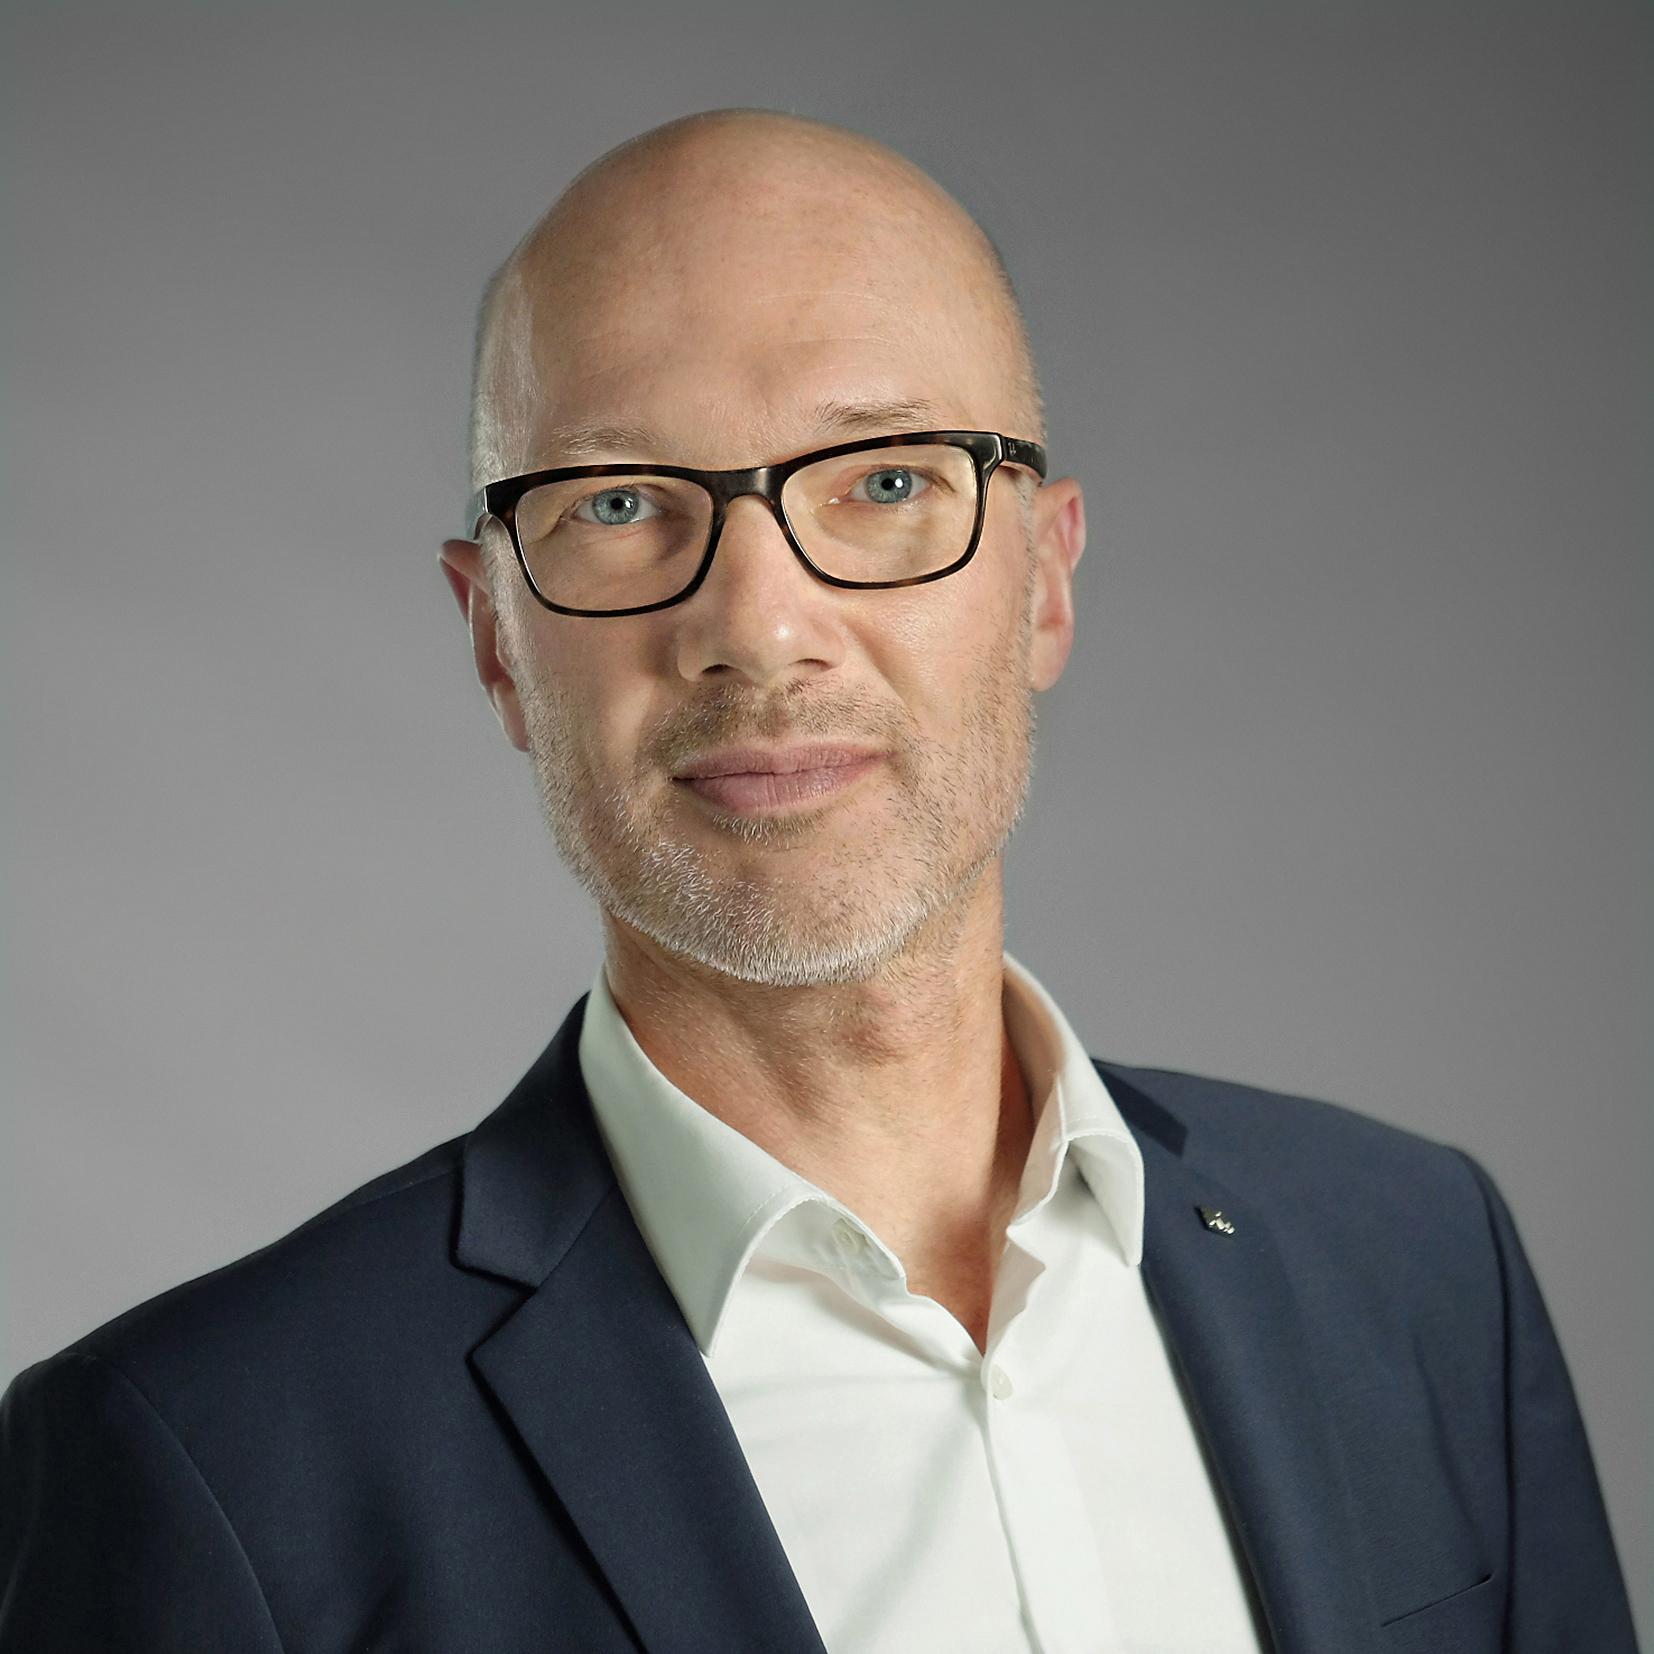 Robert Nuscheler